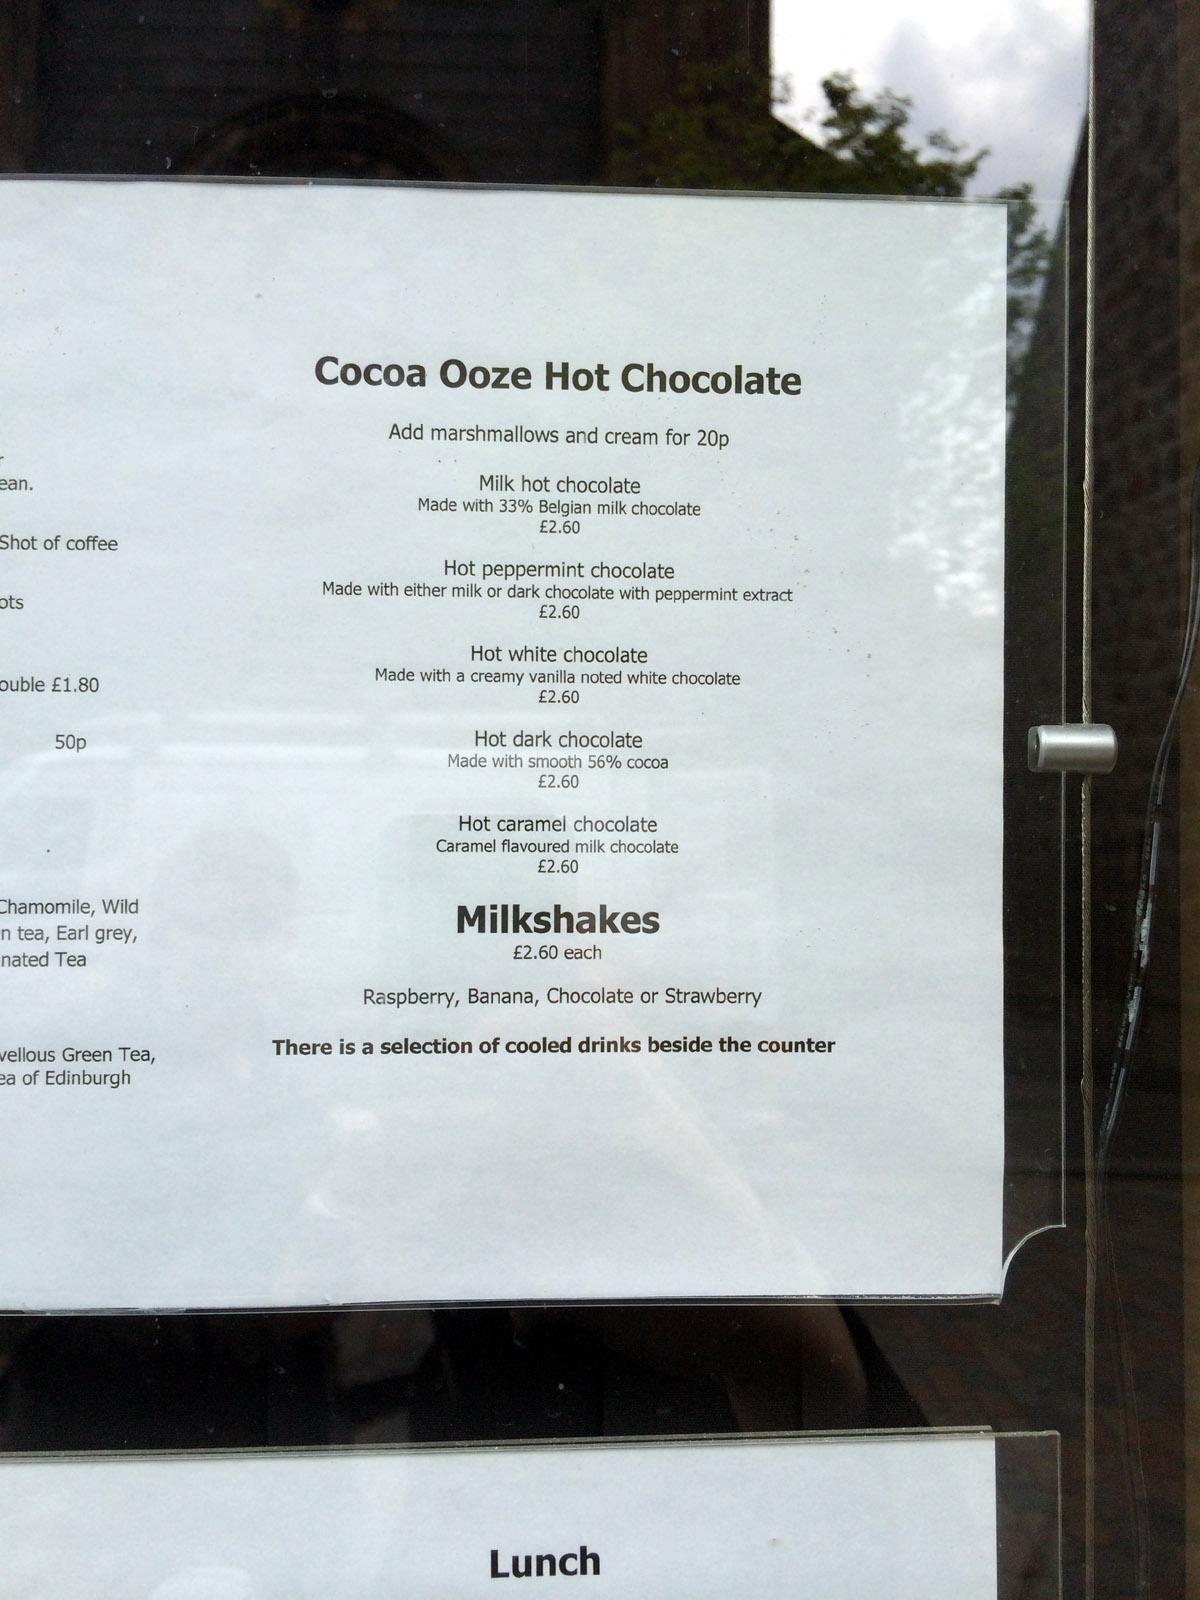 07 cocoa ooze